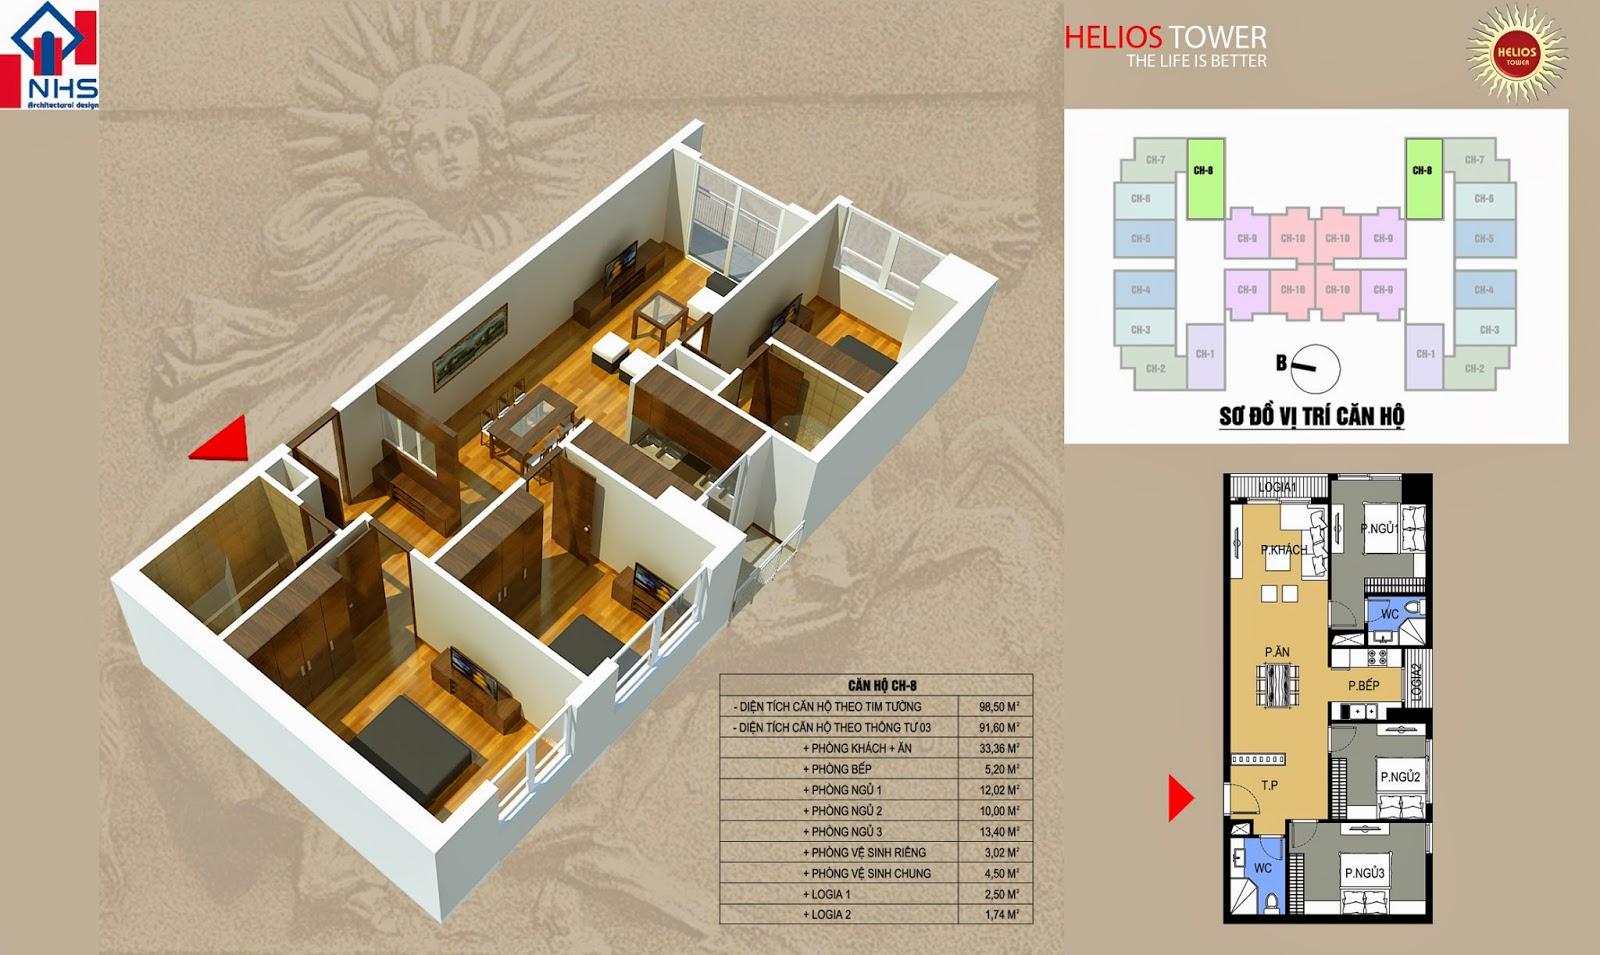 Căn 08 Helios Tower 75 Tam Trinh